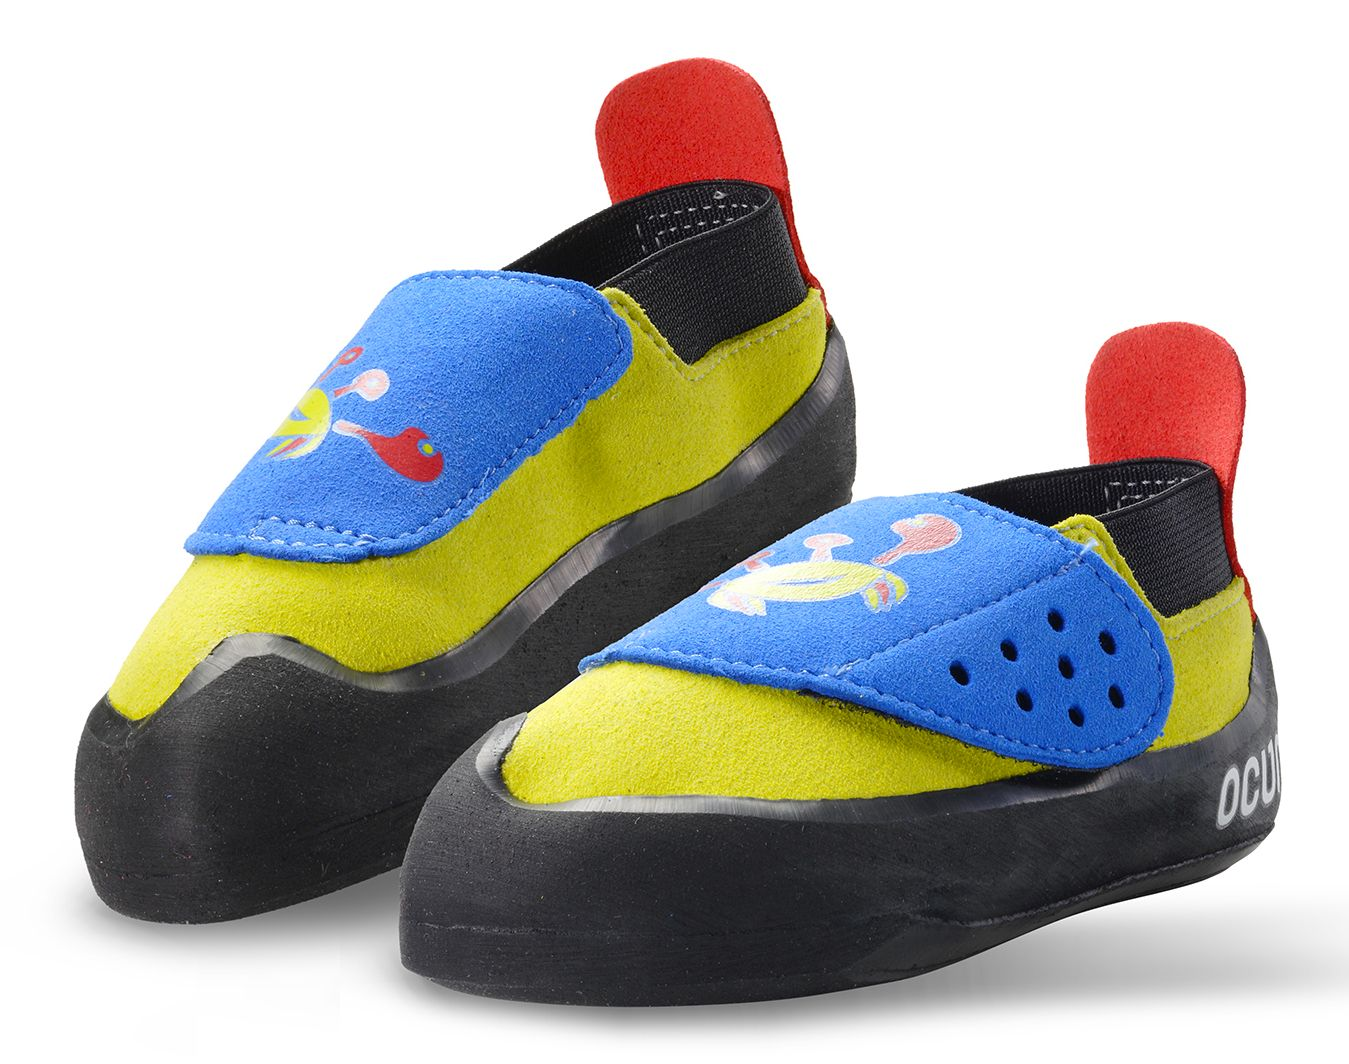 Buty Wspinaczkowe Ocun Hero QC 38 Blue Yellow